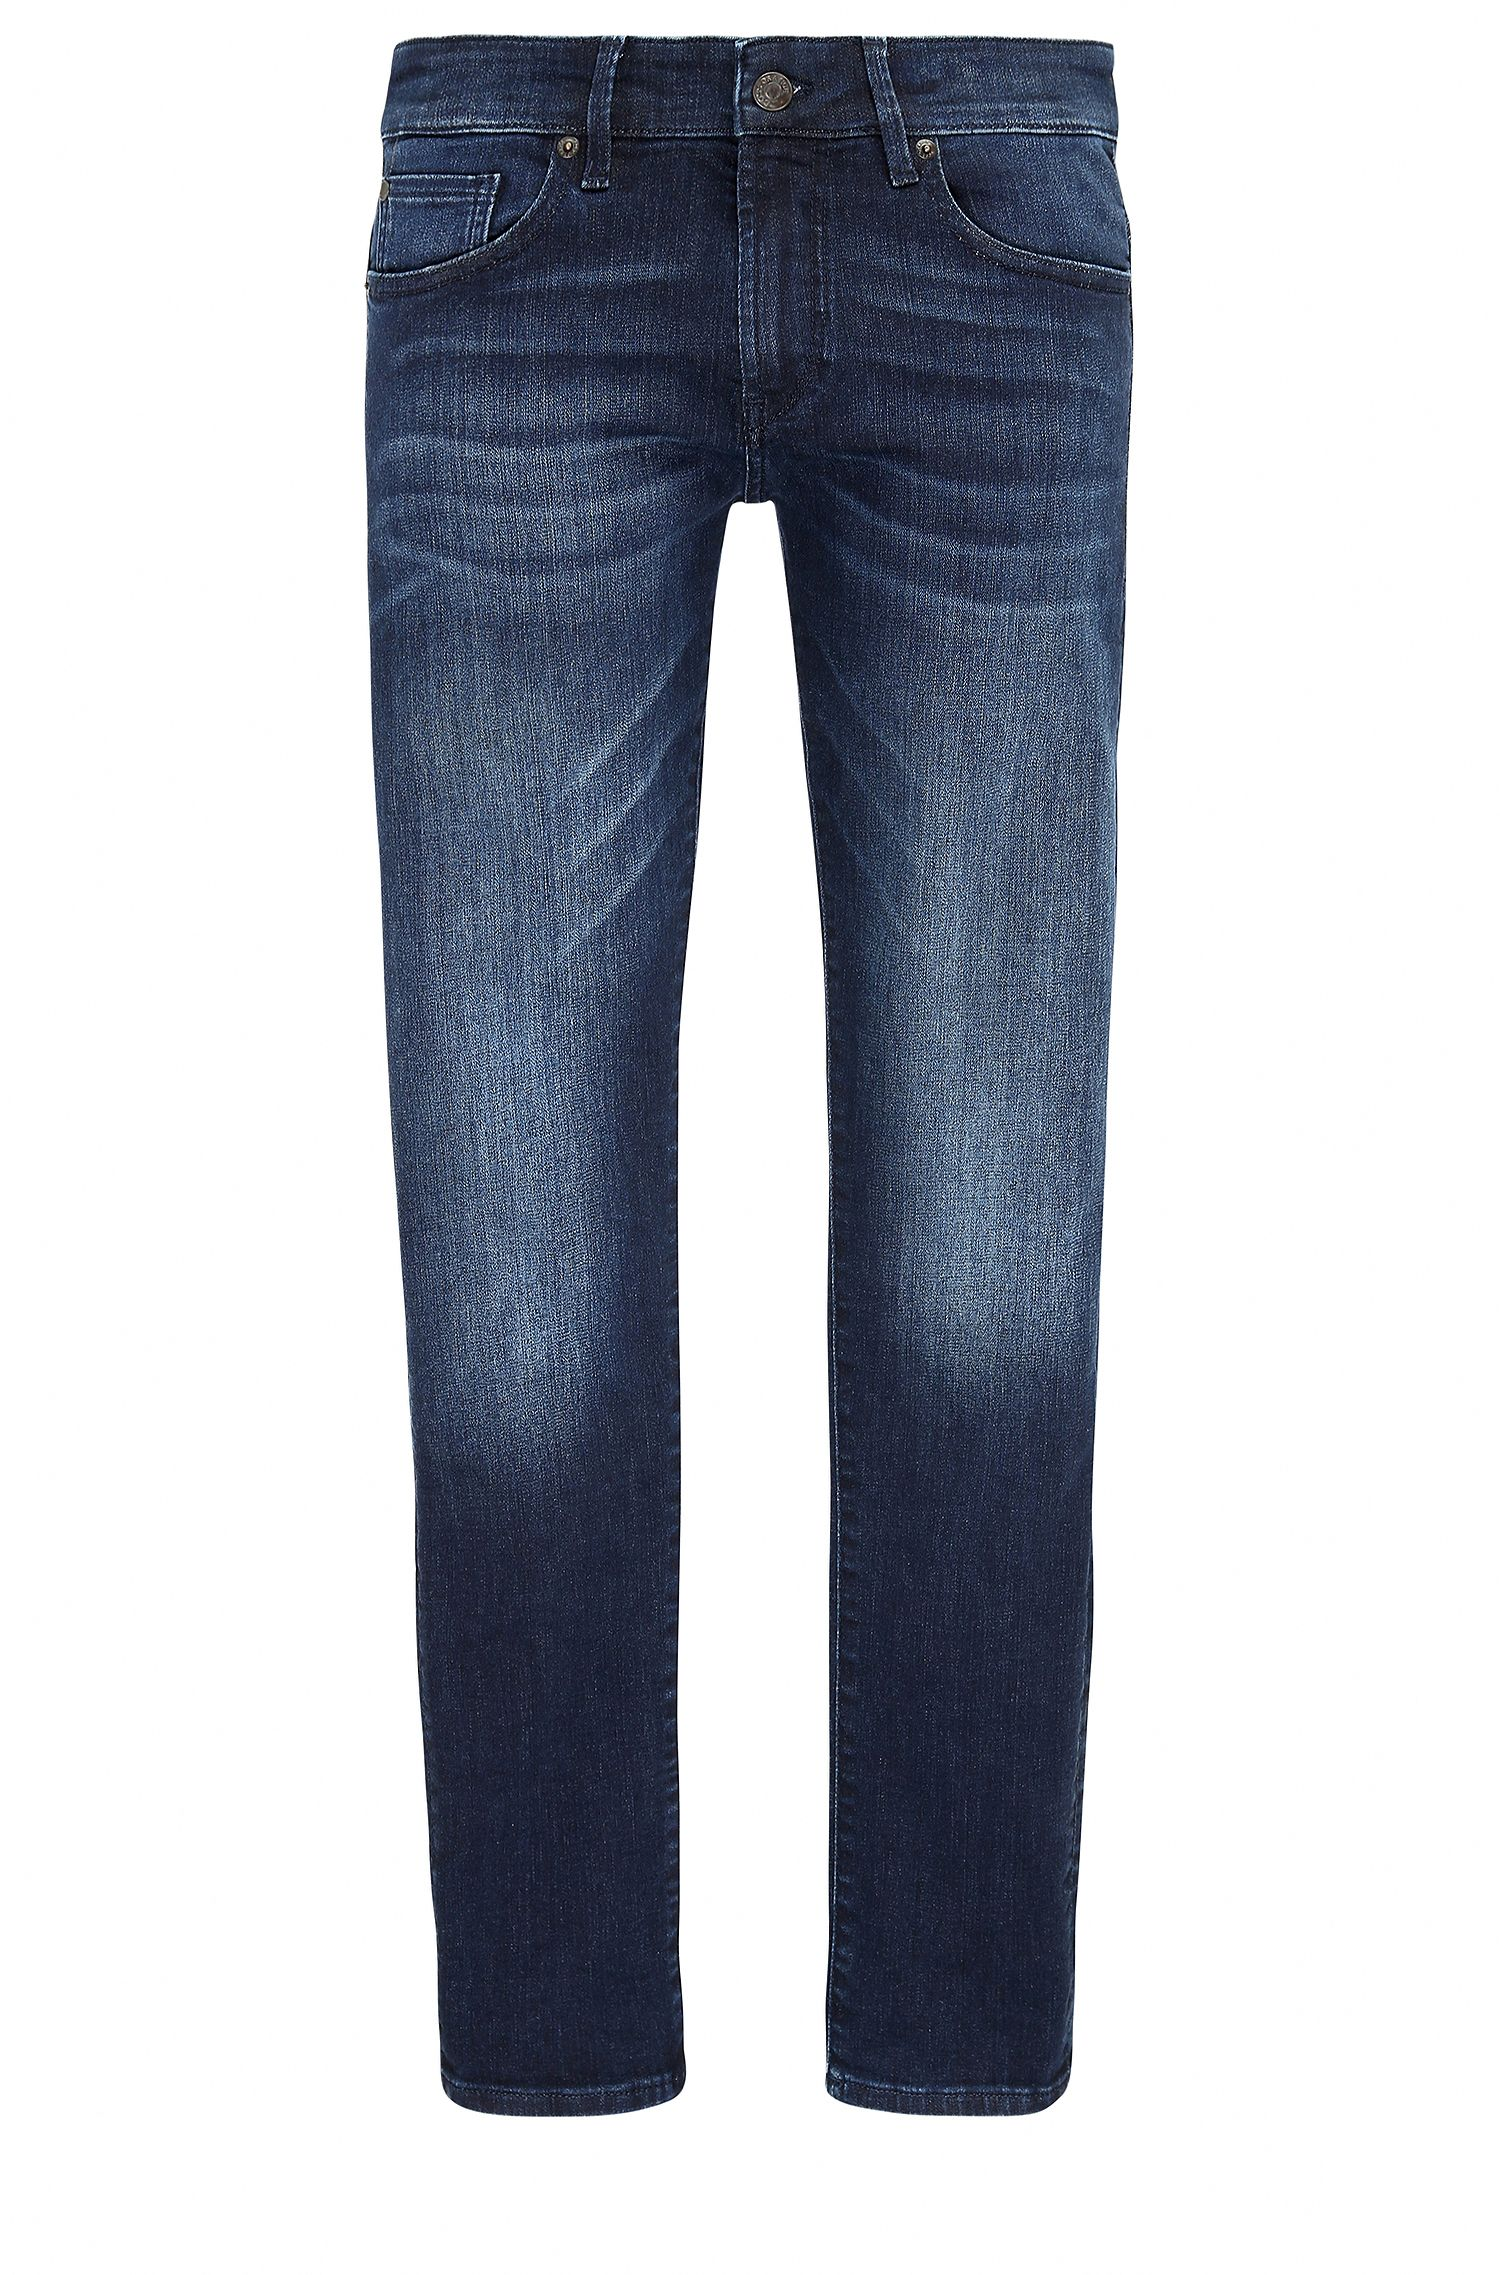 Jeans Skinny Fit en denim ultrastretch à la finition usée